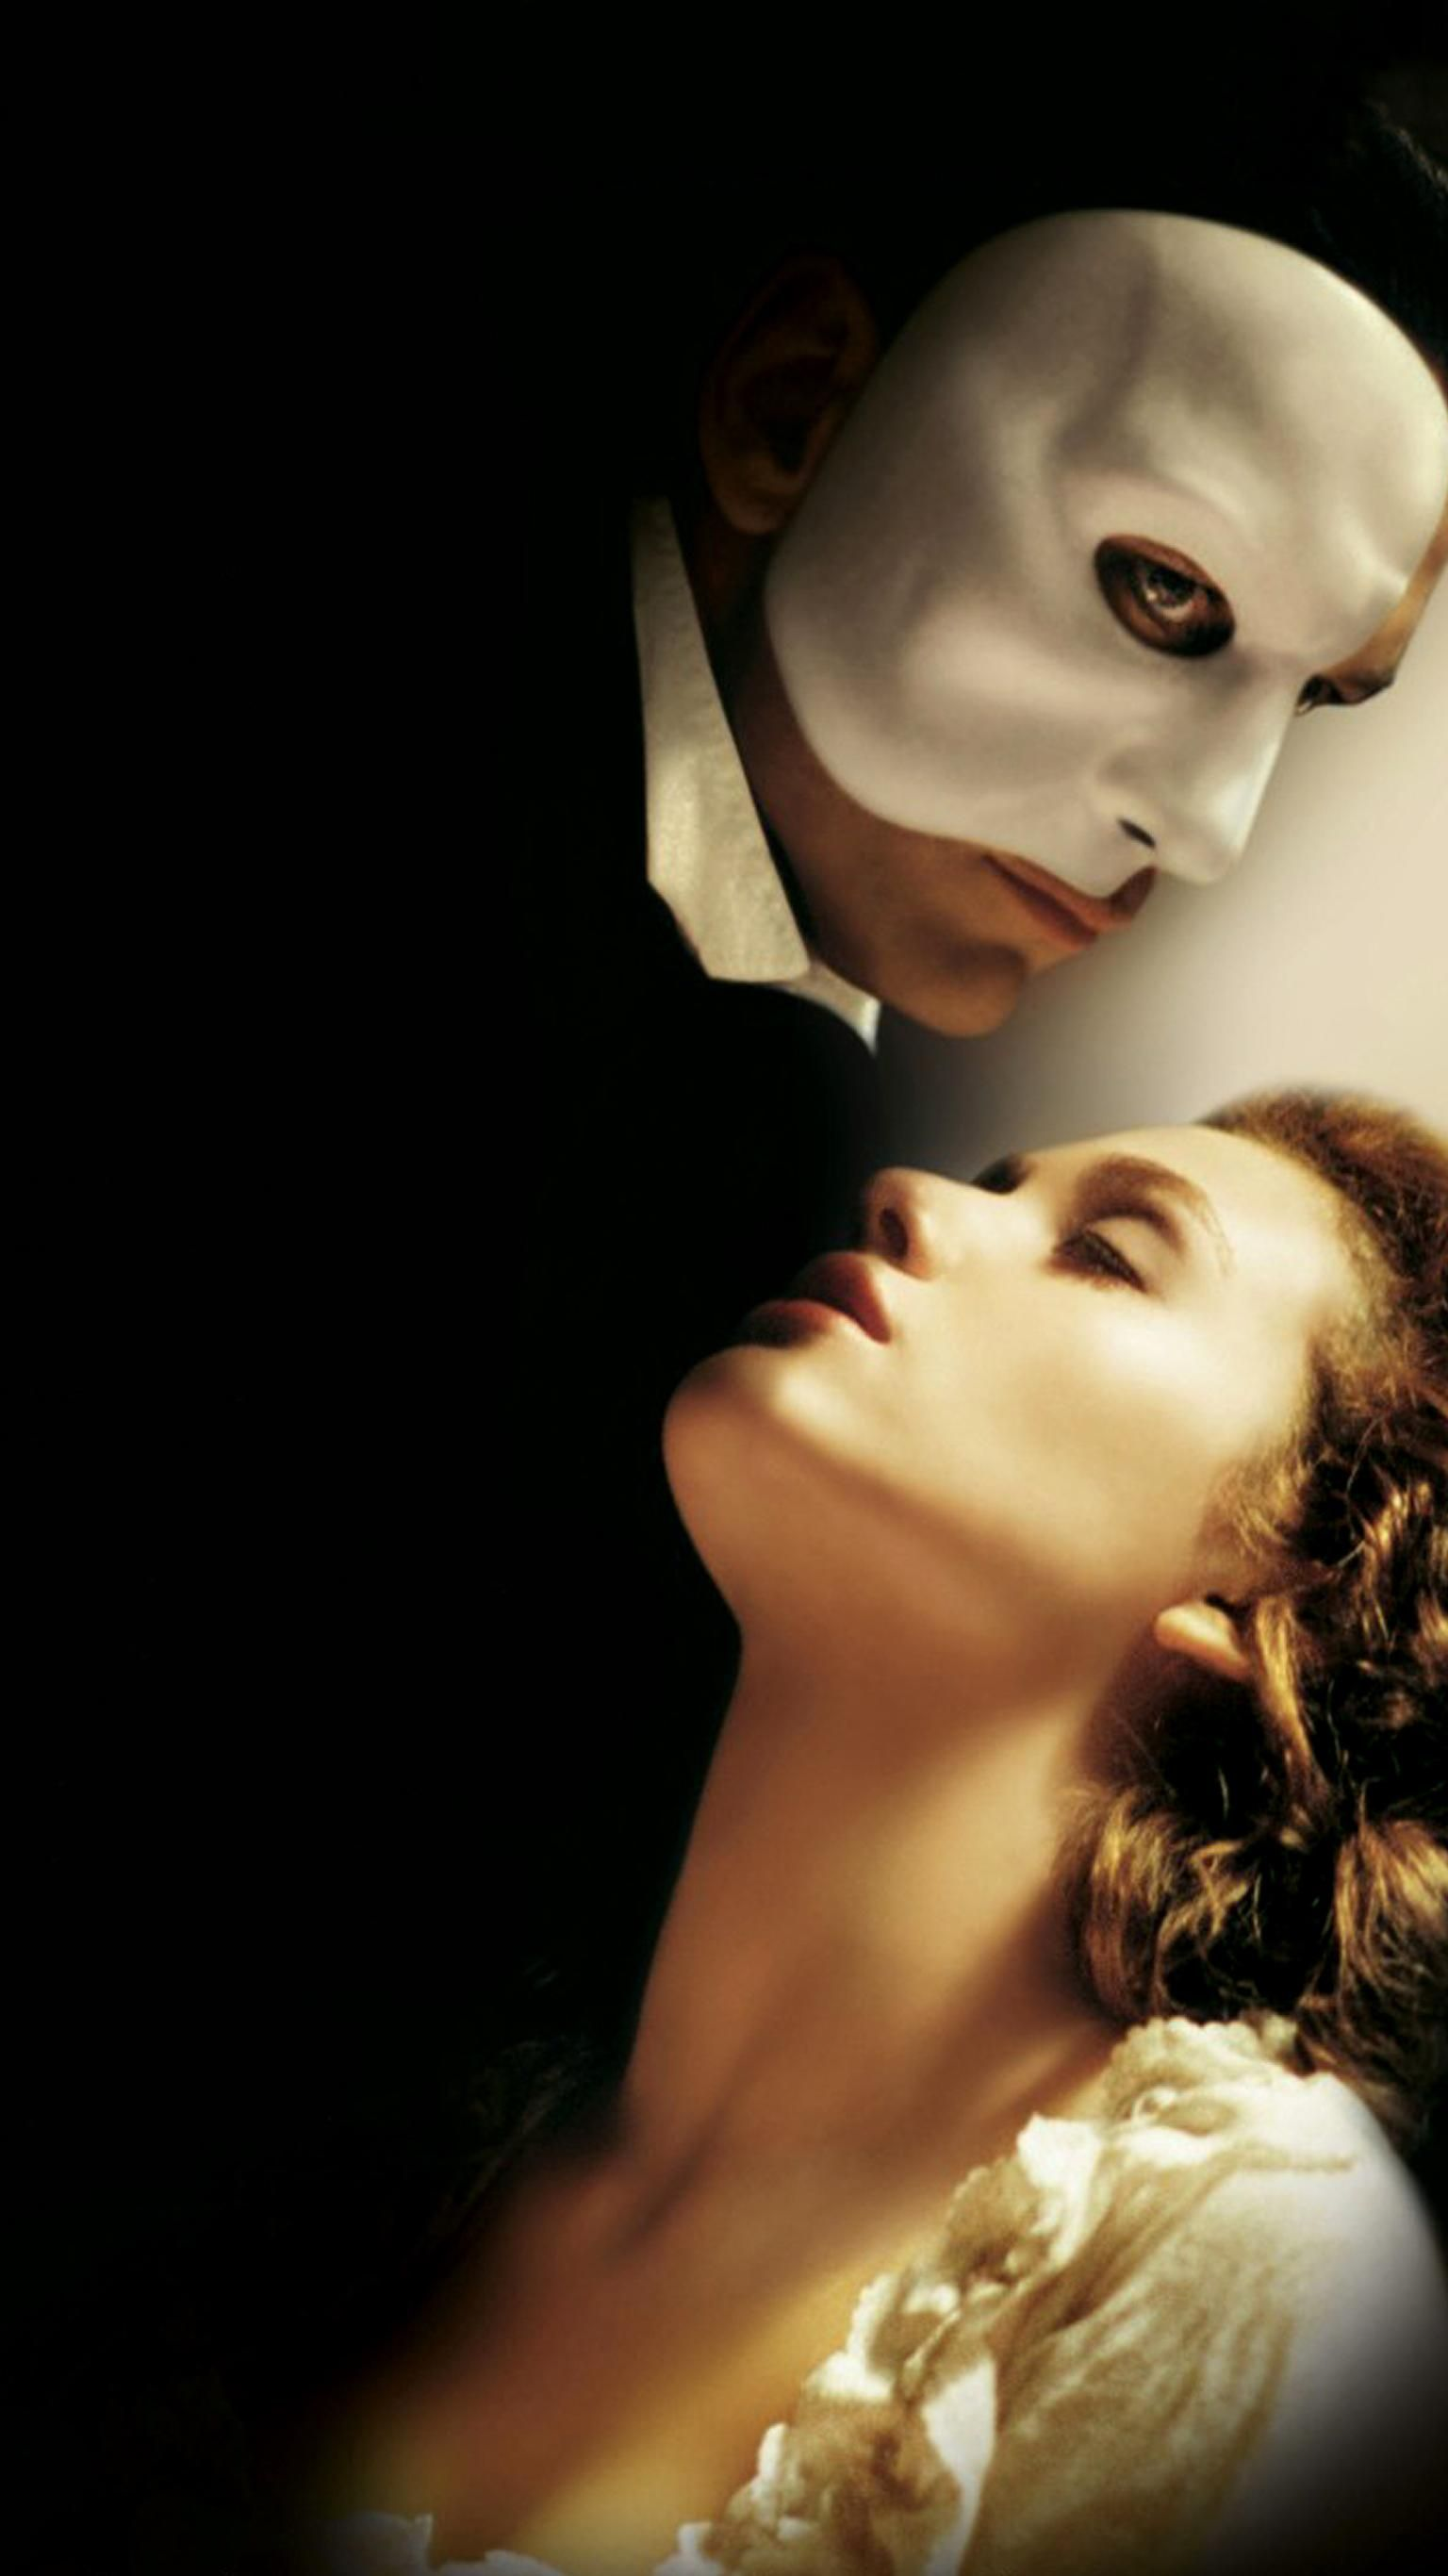 The Phantom Of The Opera 2004 Phone Wallpaper Moviemania Phantom Of The Opera Phantom Opera